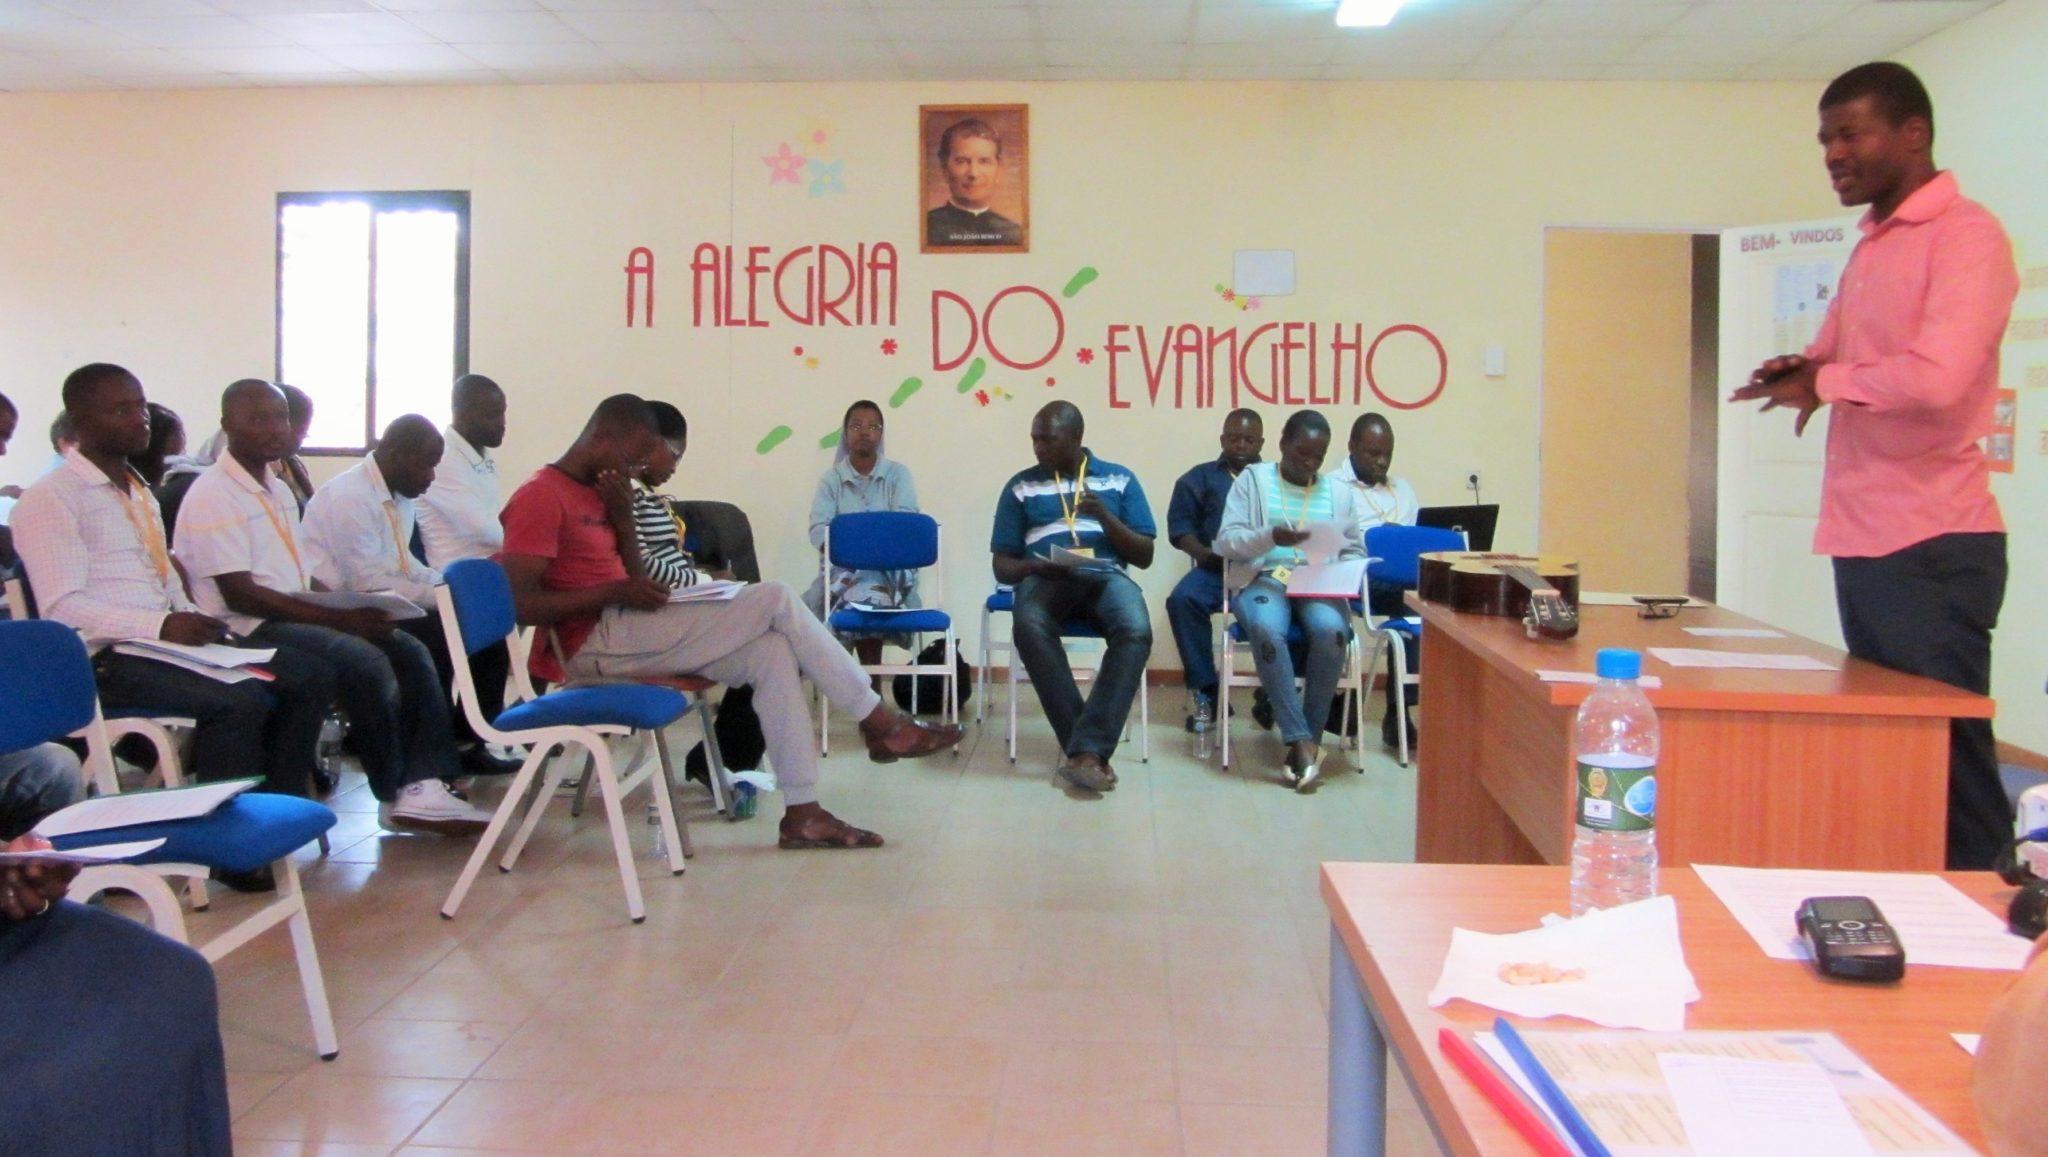 Projekt 490 - Angola